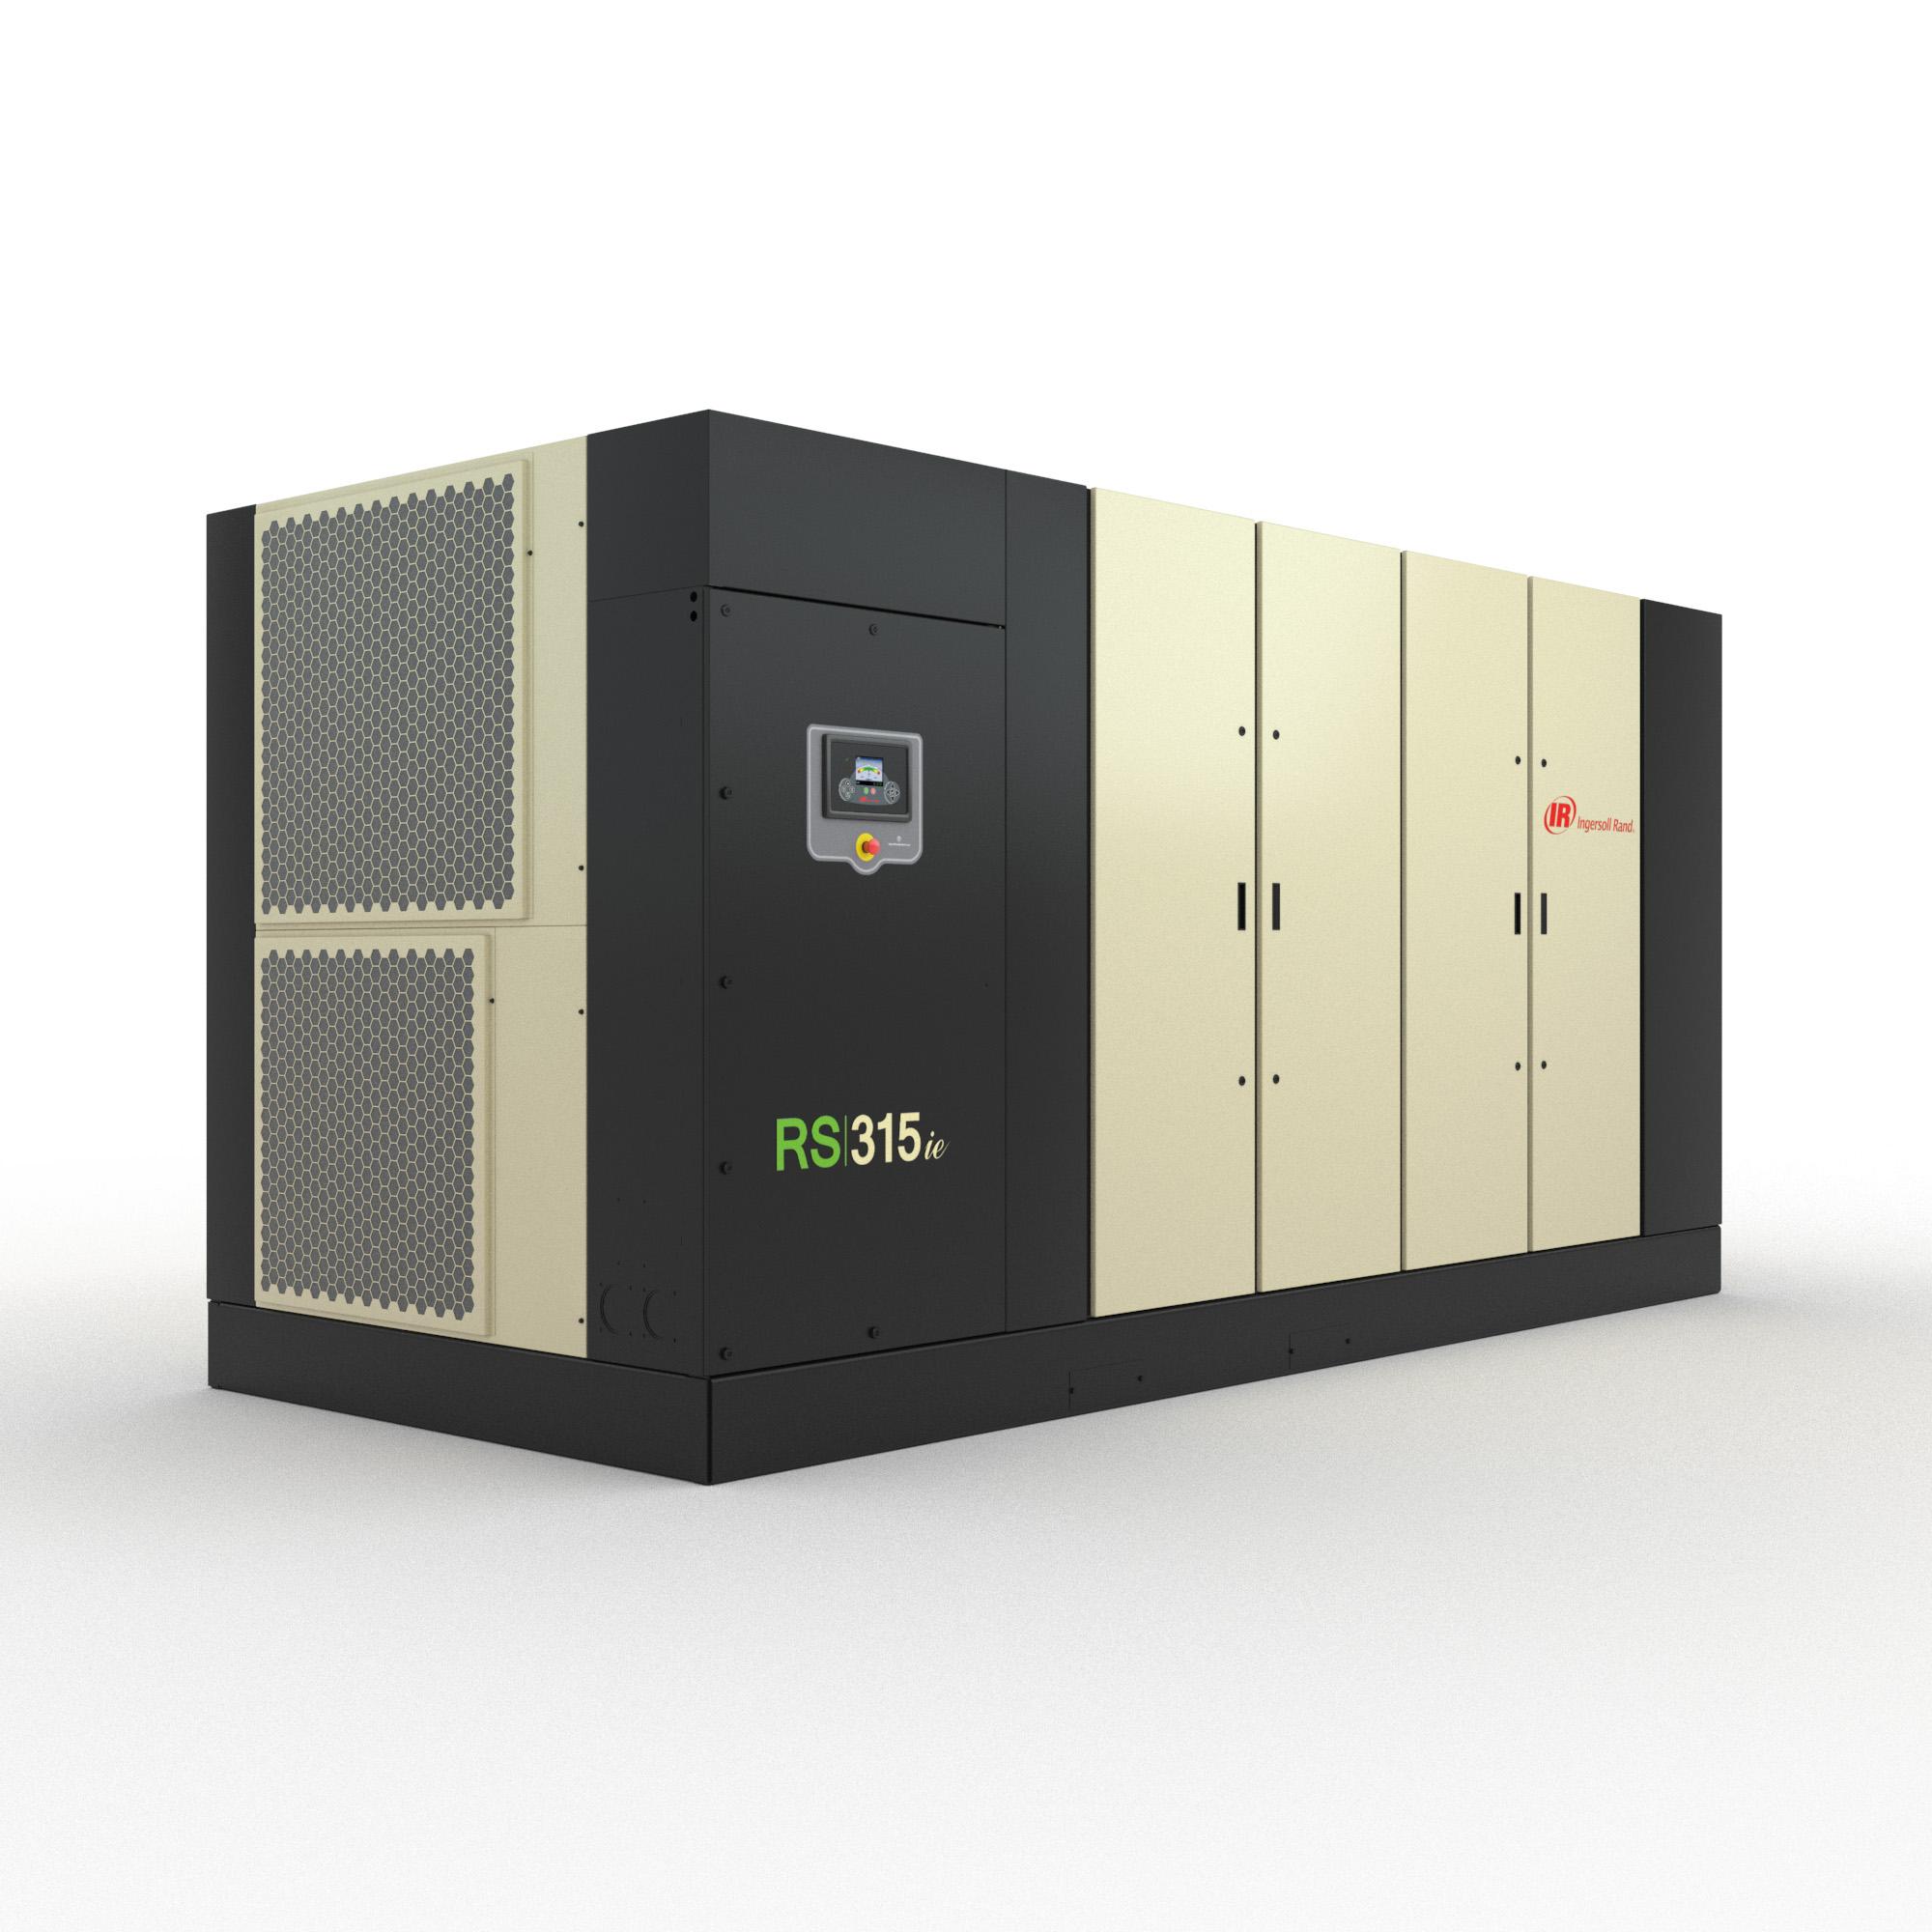 RS315-355ne